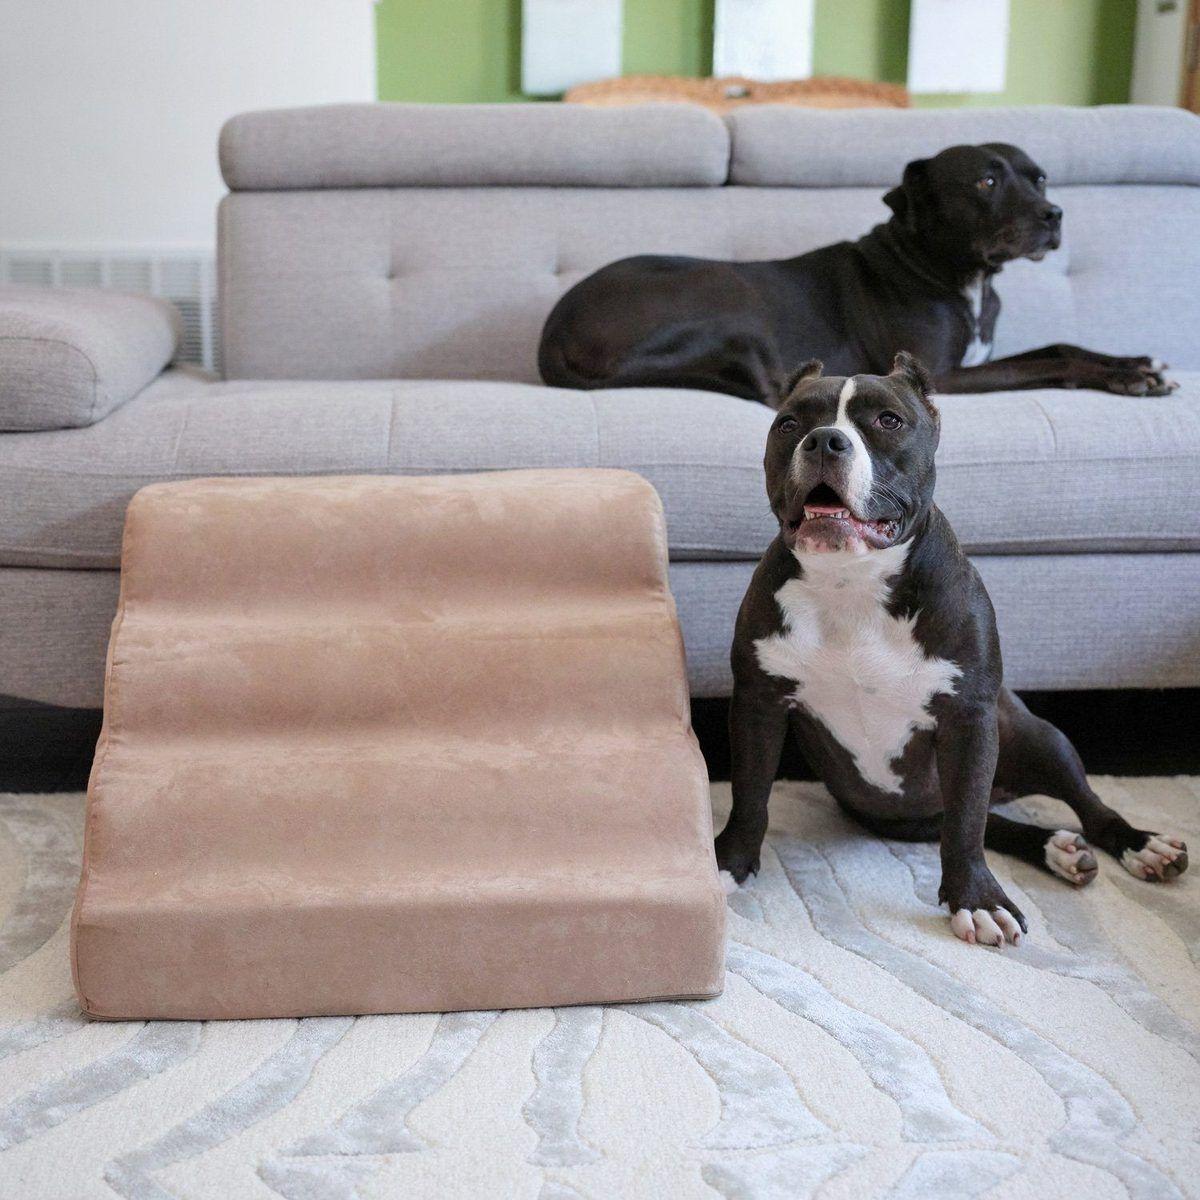 Companion ramp dog ramp dog ramp for bed dog bed